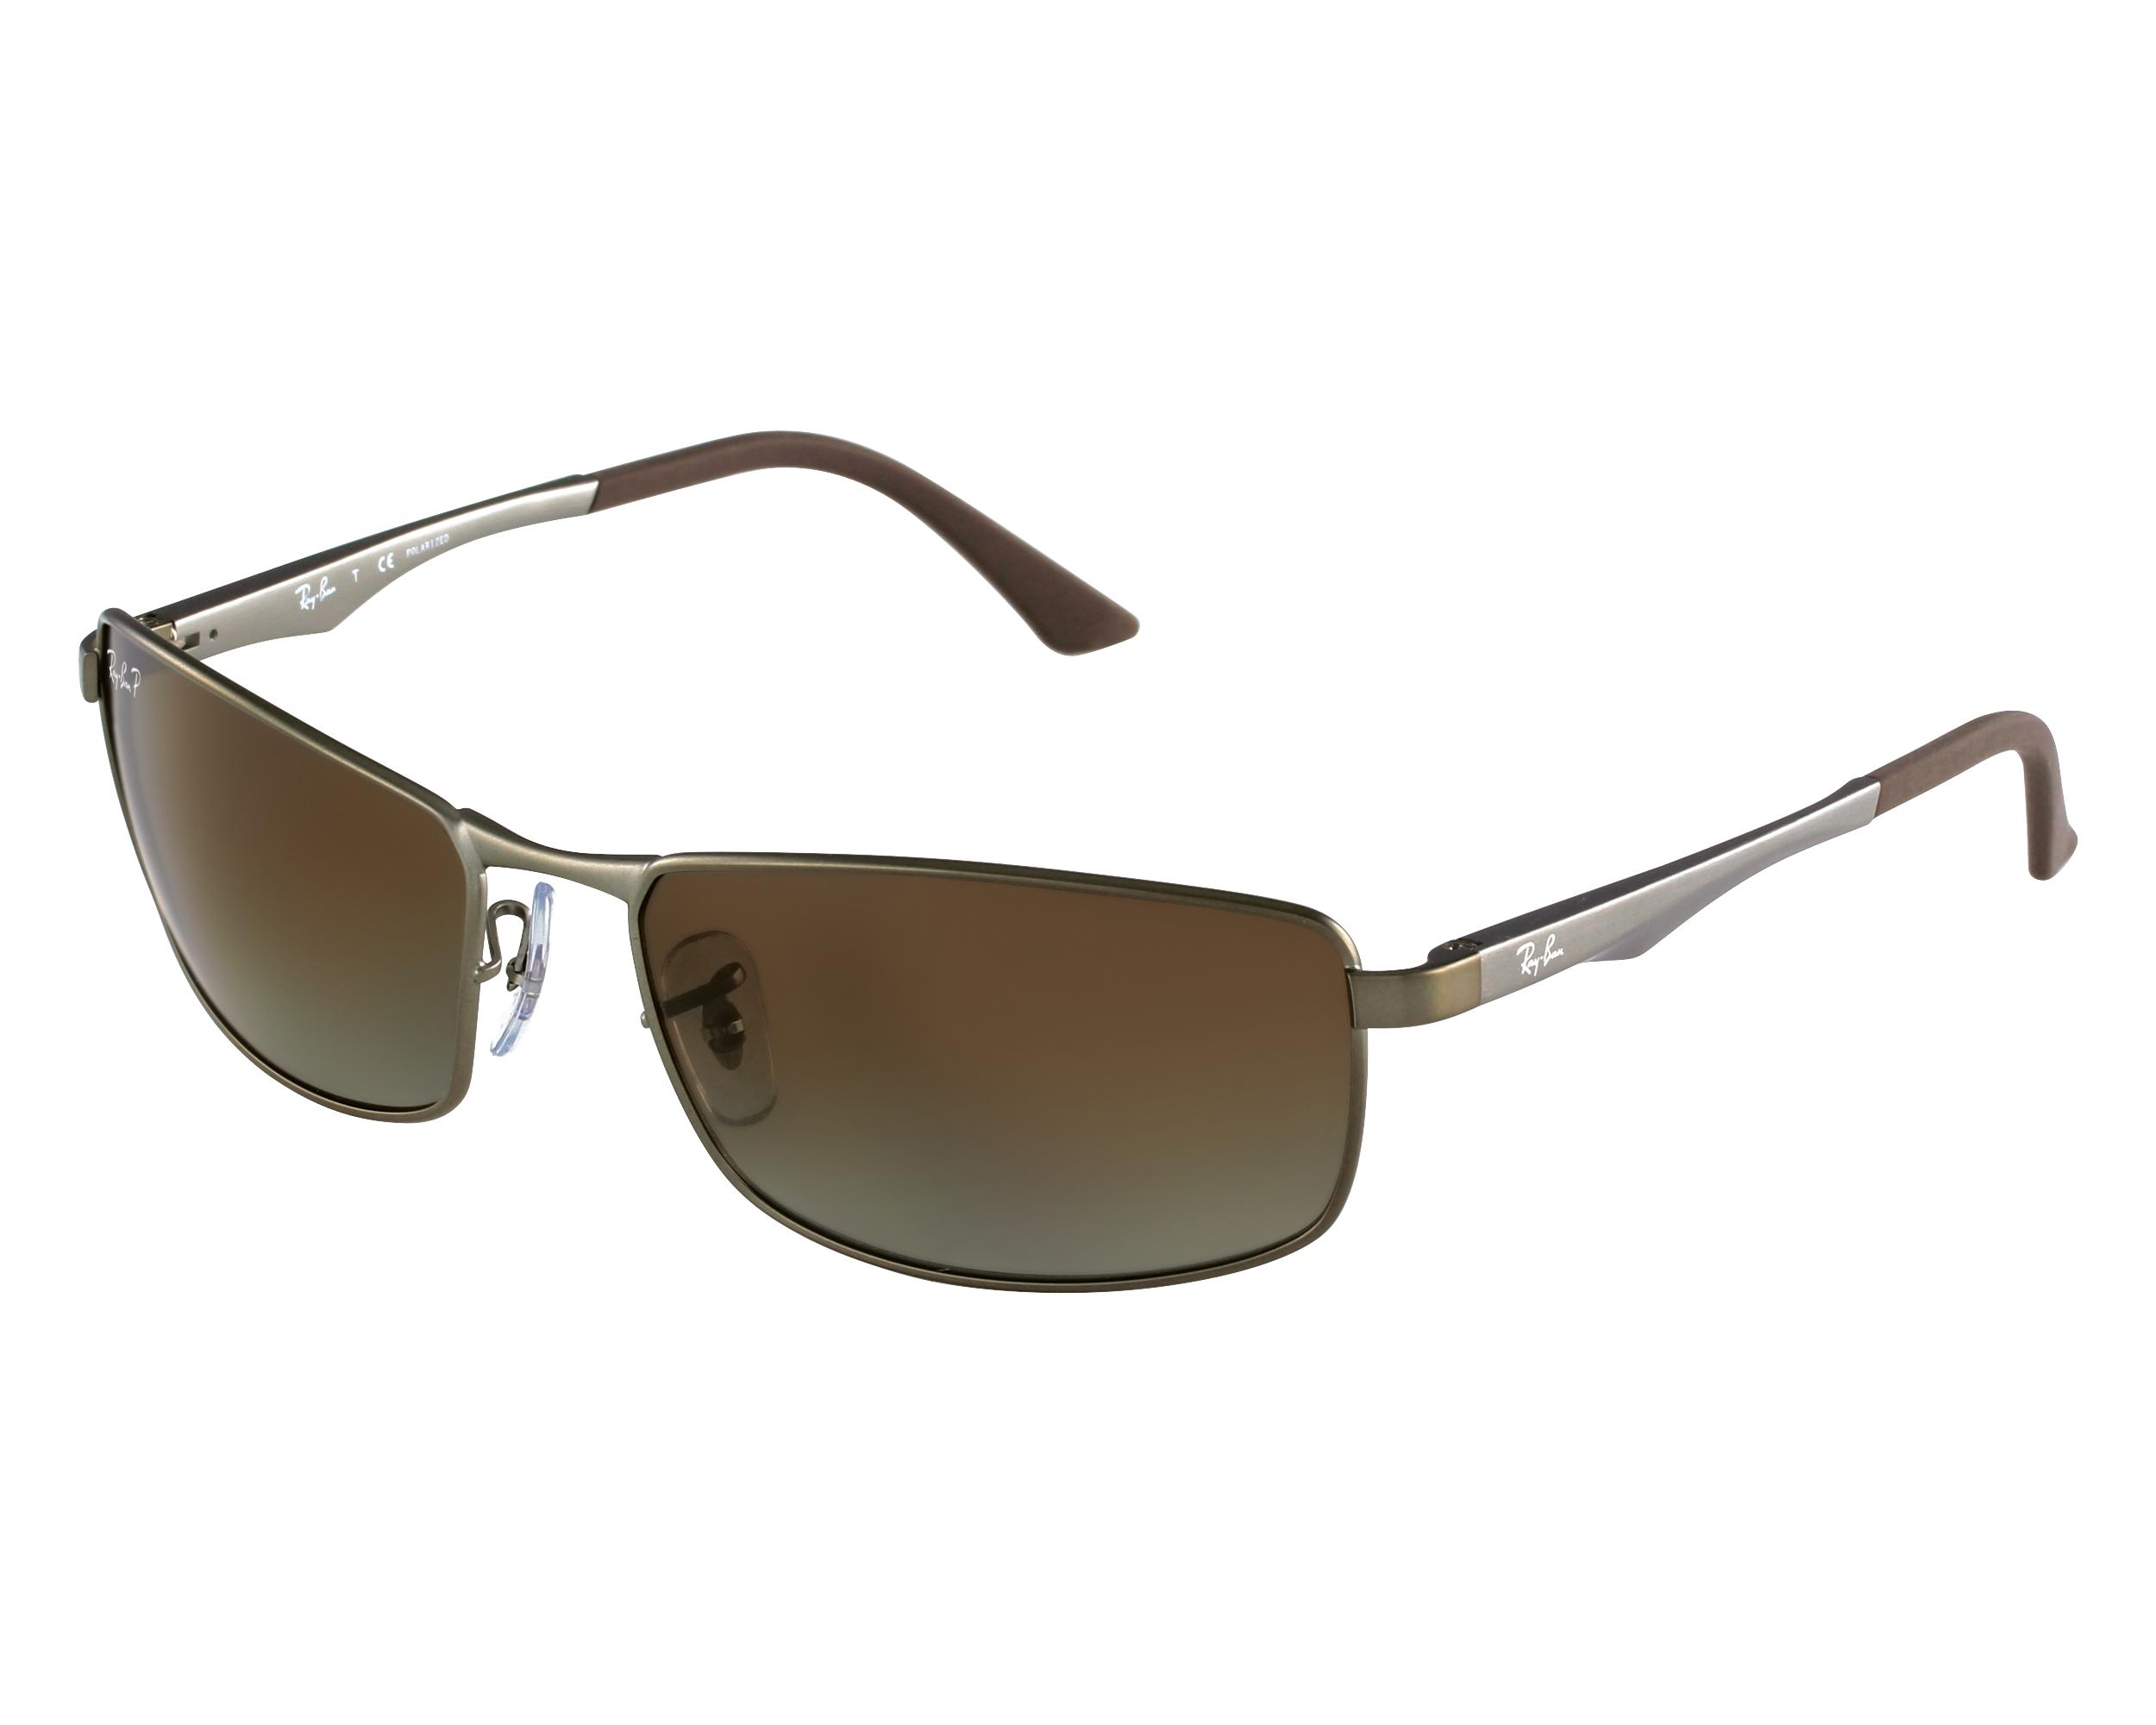 33c5aecc6e Sunglasses Ray-Ban RB-3498 029 T5 61-17 Gun Grey front